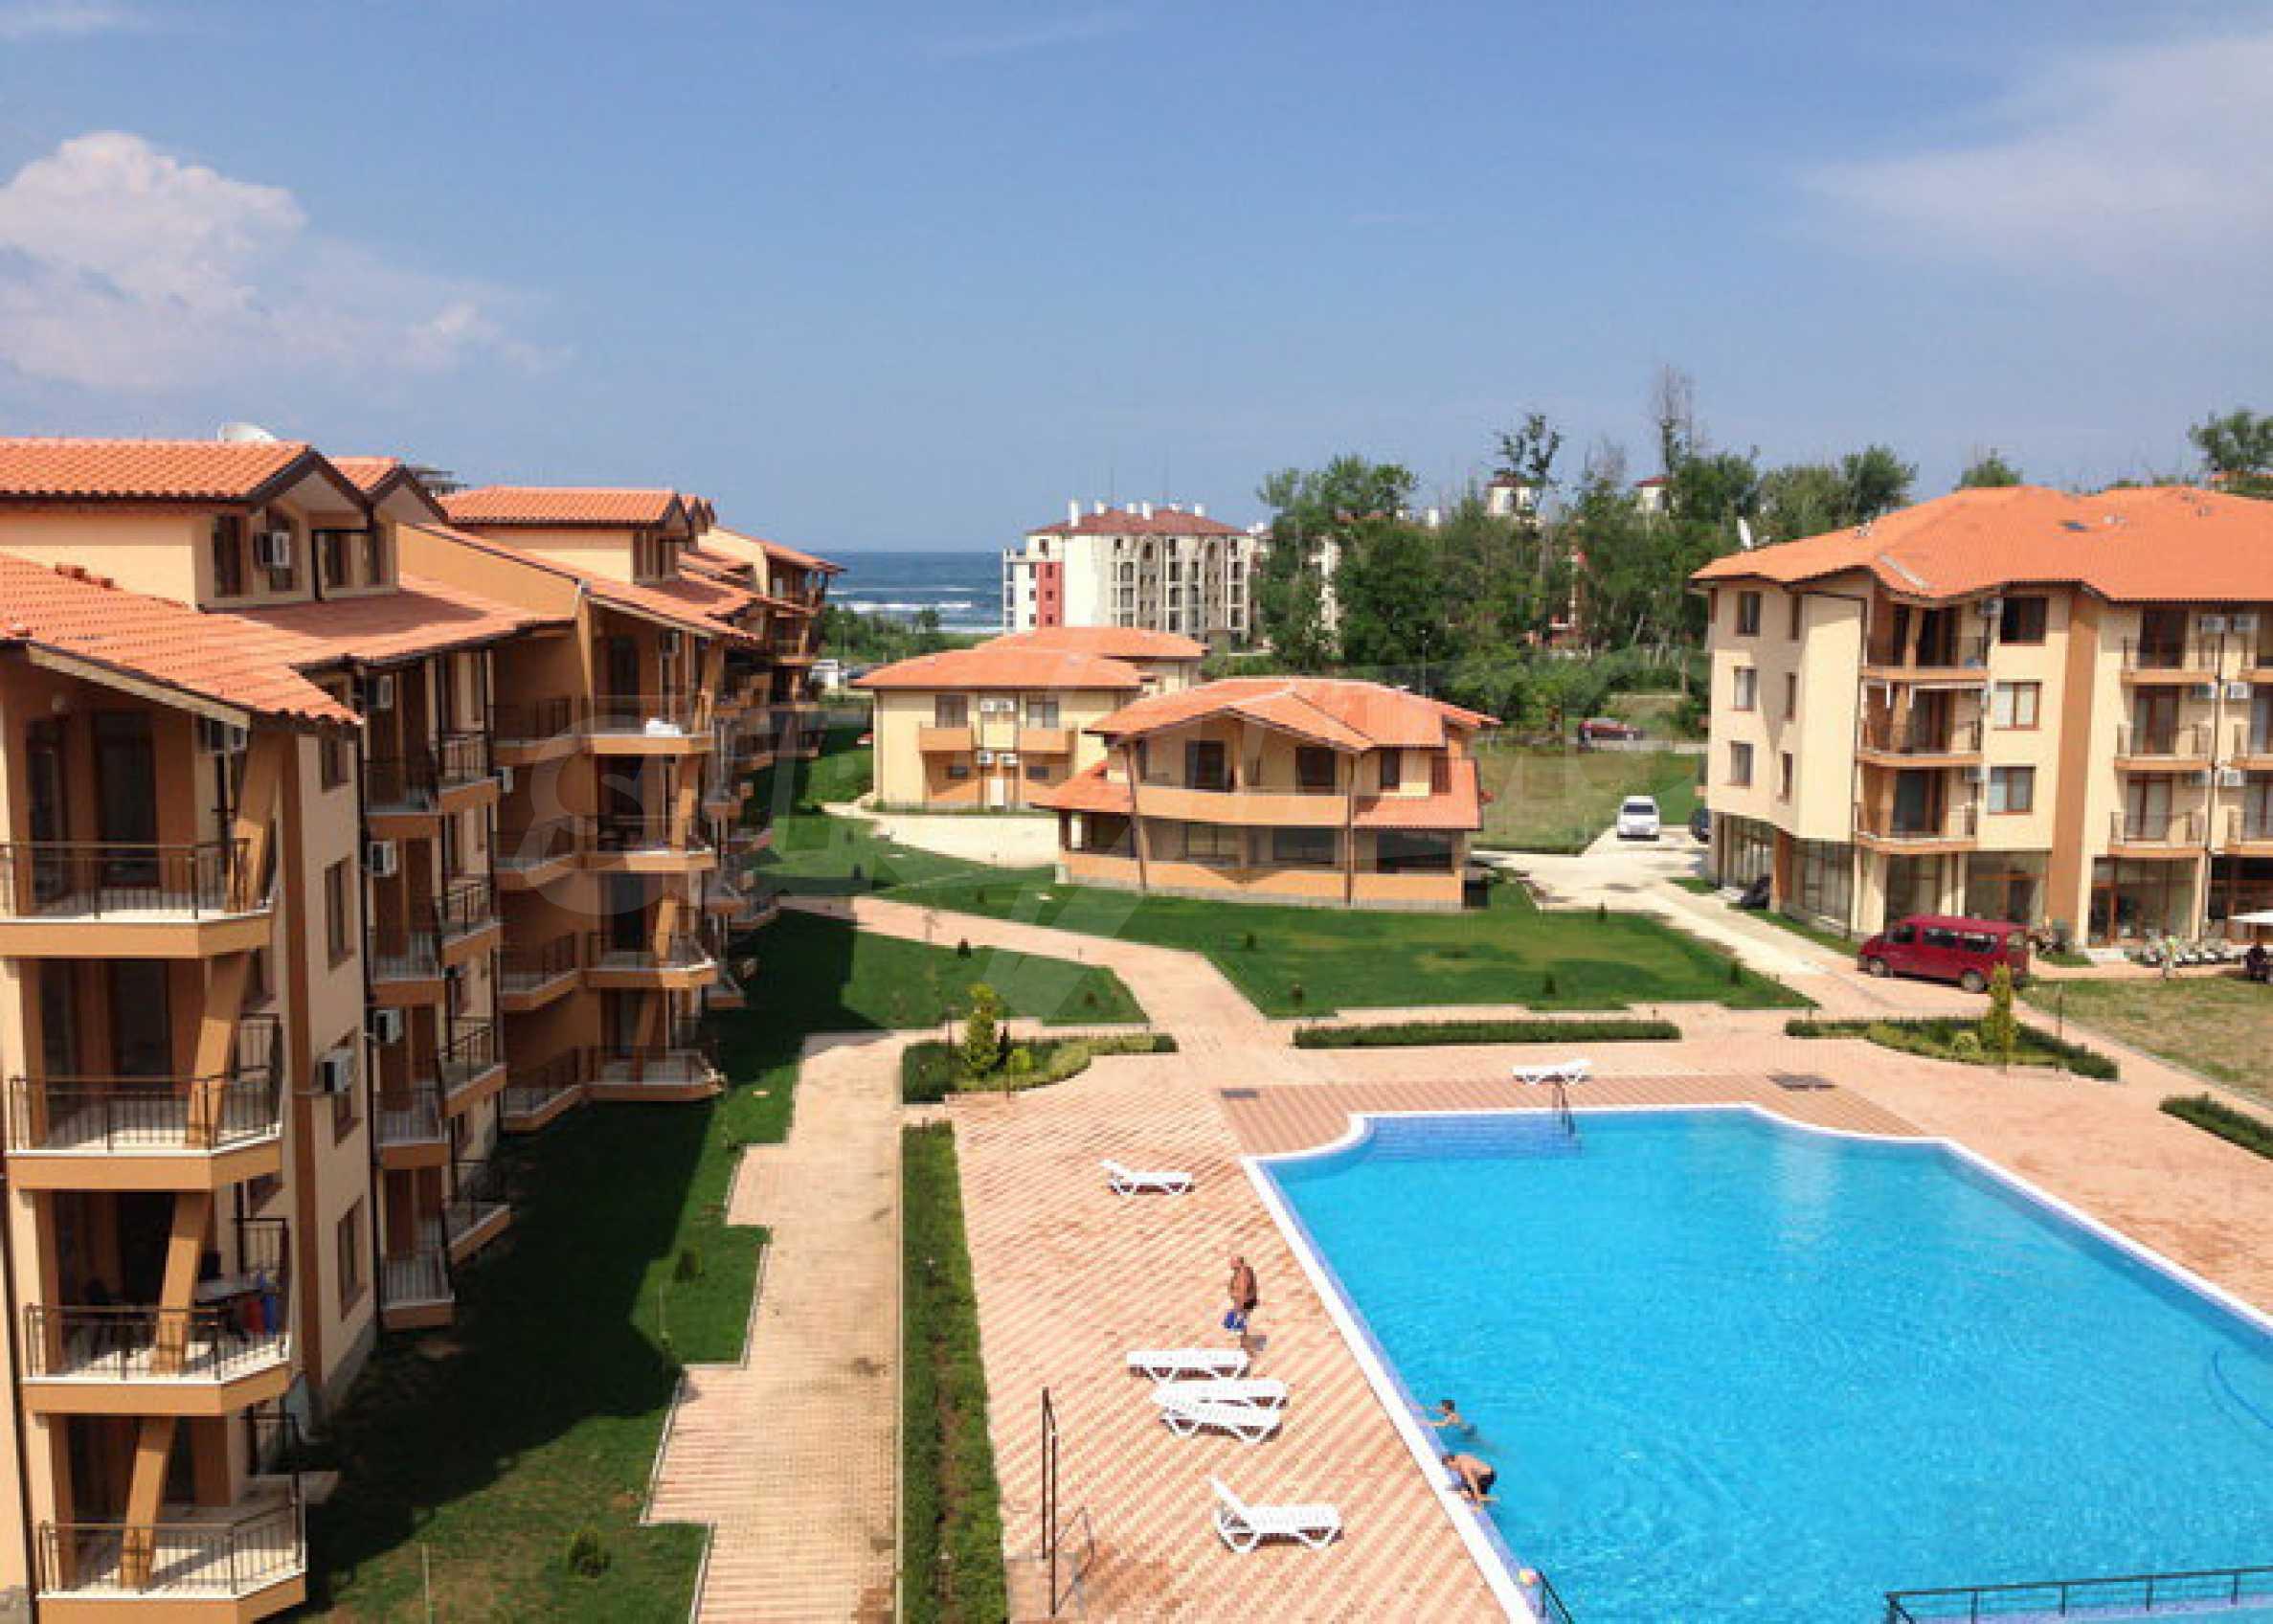 Studios und Apartments im Nestinarka-Komplex in Tsarevo